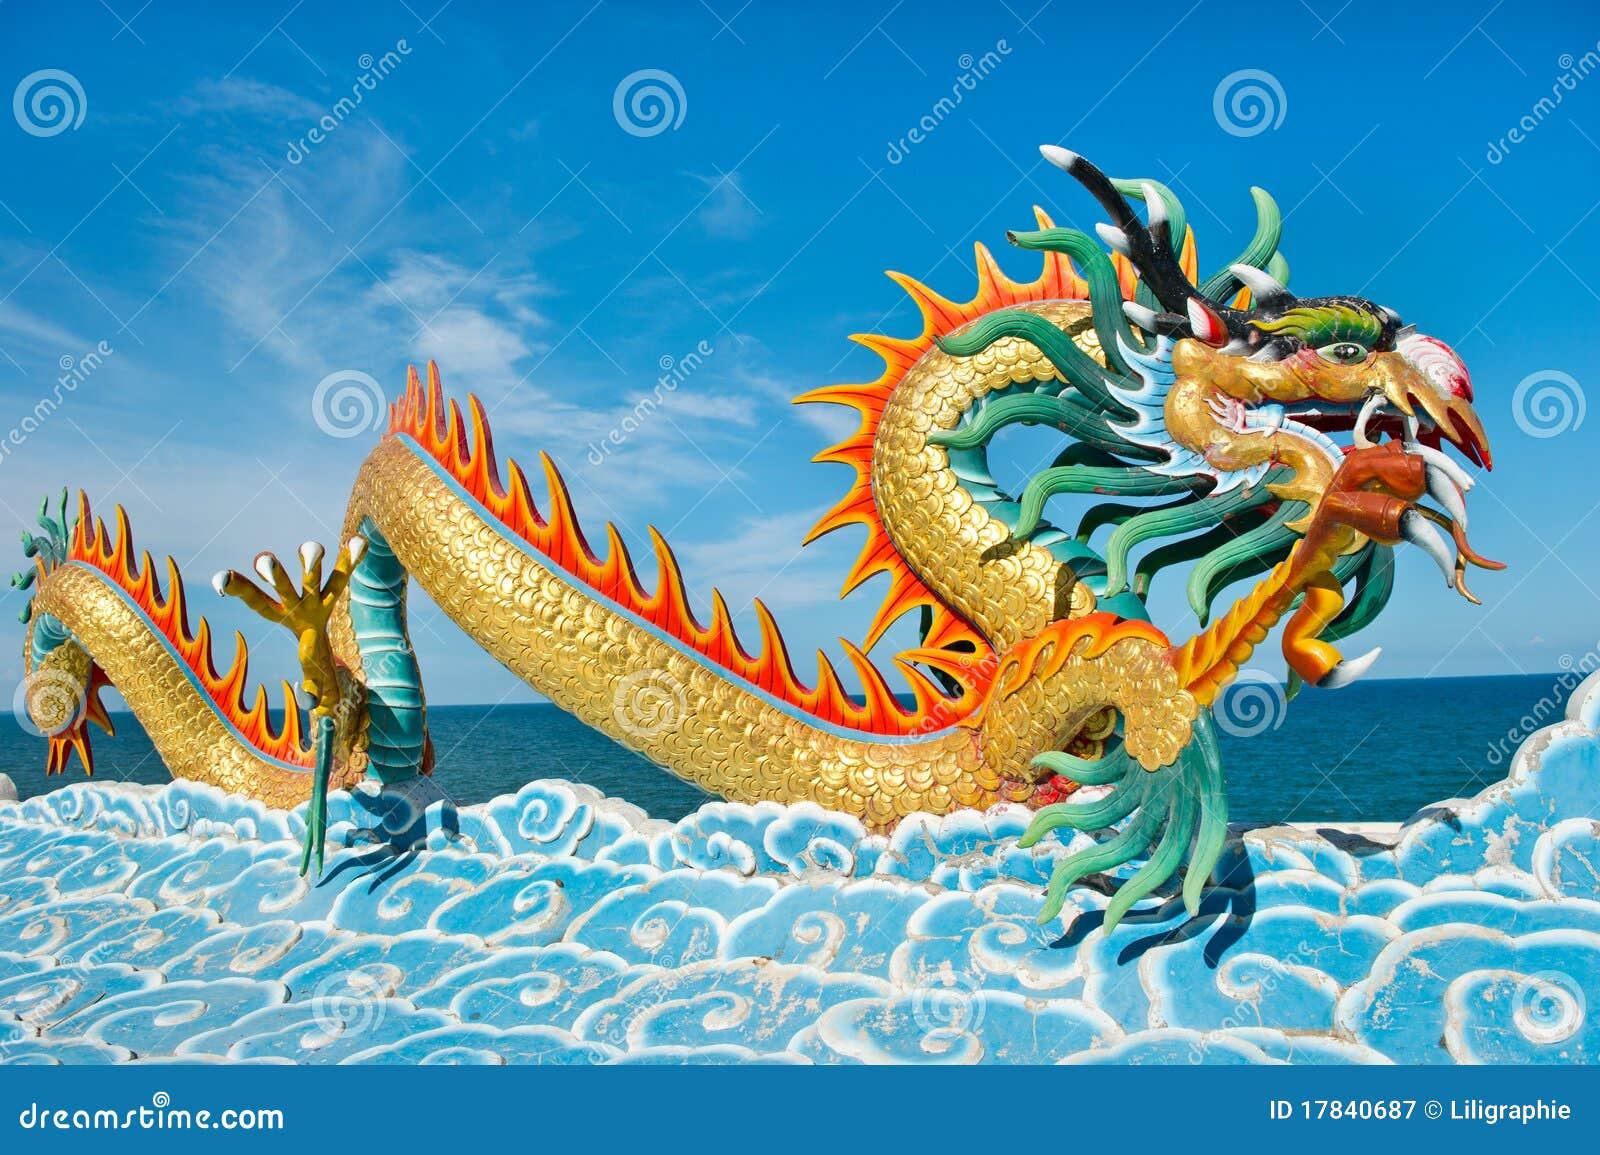 Beautiful Dragons Hot Girls Wallpaper